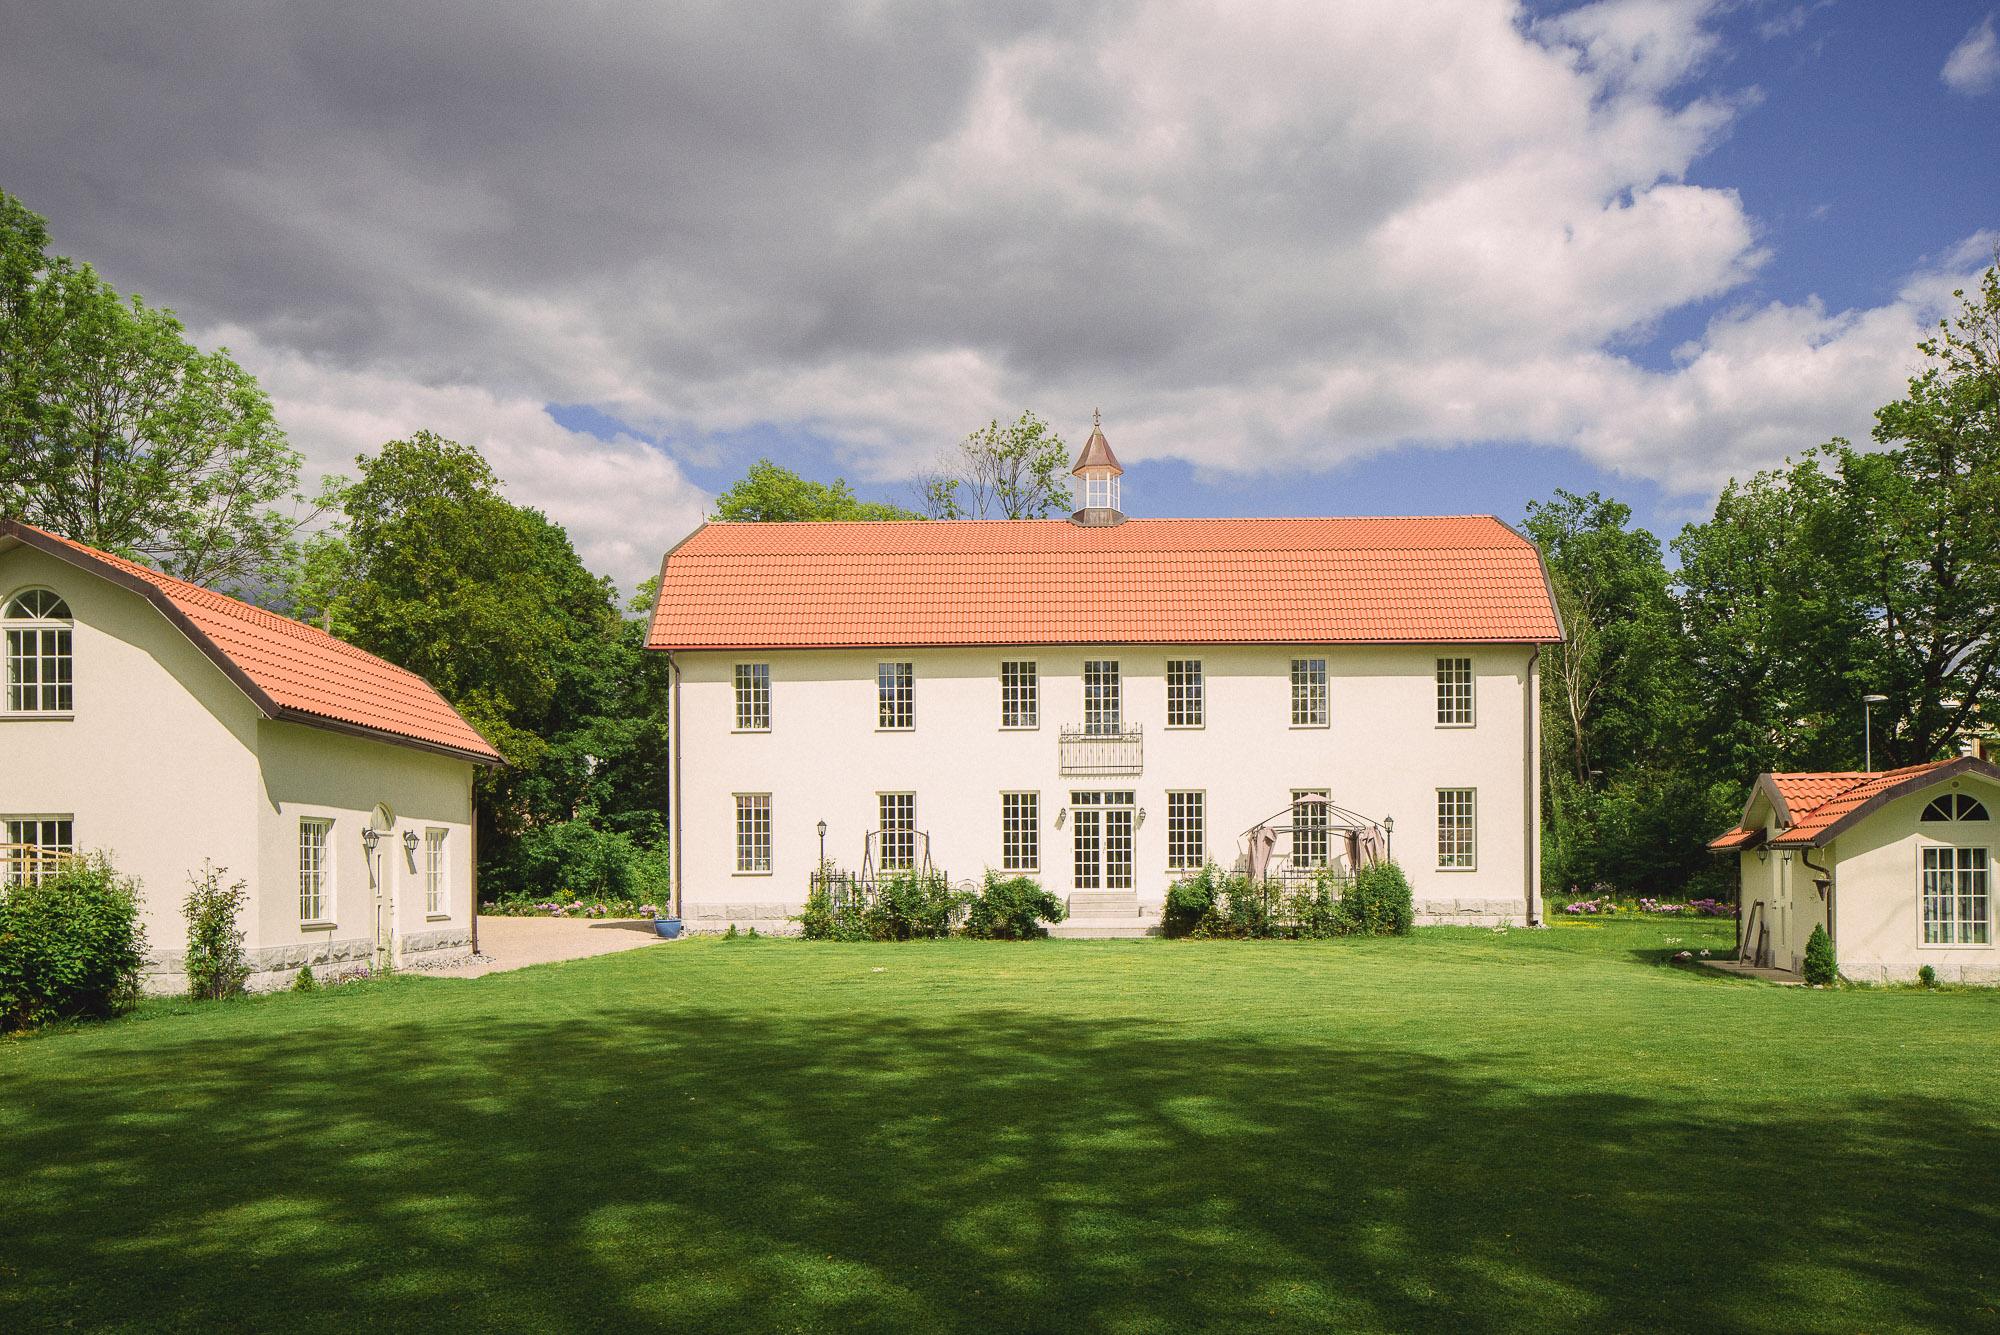 Property For Sale at Newly built mansion in Djursholm